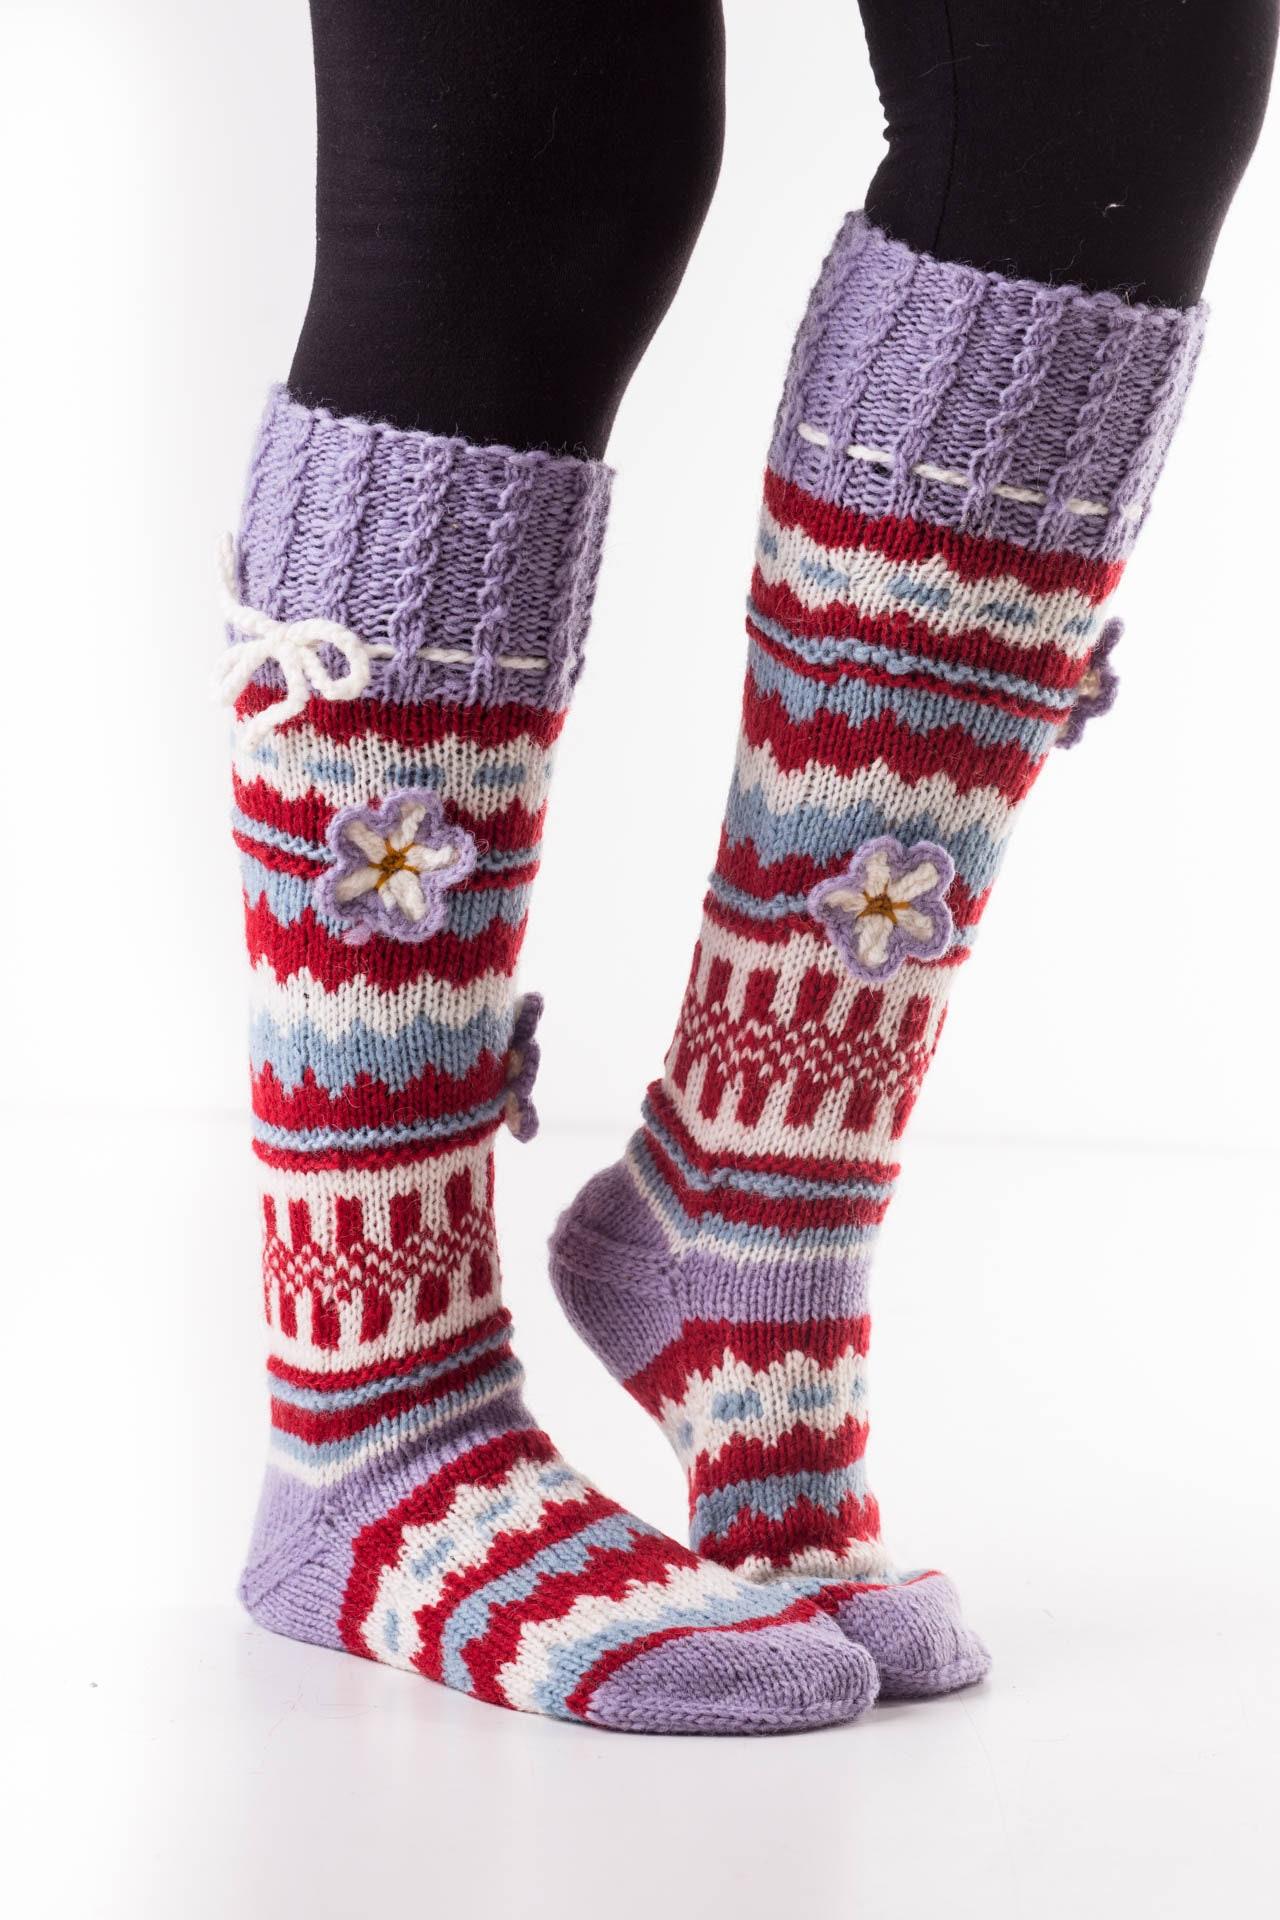 f2eb084bbe4 Aydin Hand Knit Wool Knee High Women s Socks Warm 100% Sheep Wool Boots  Winter Socks Handmade Long Soft Socks